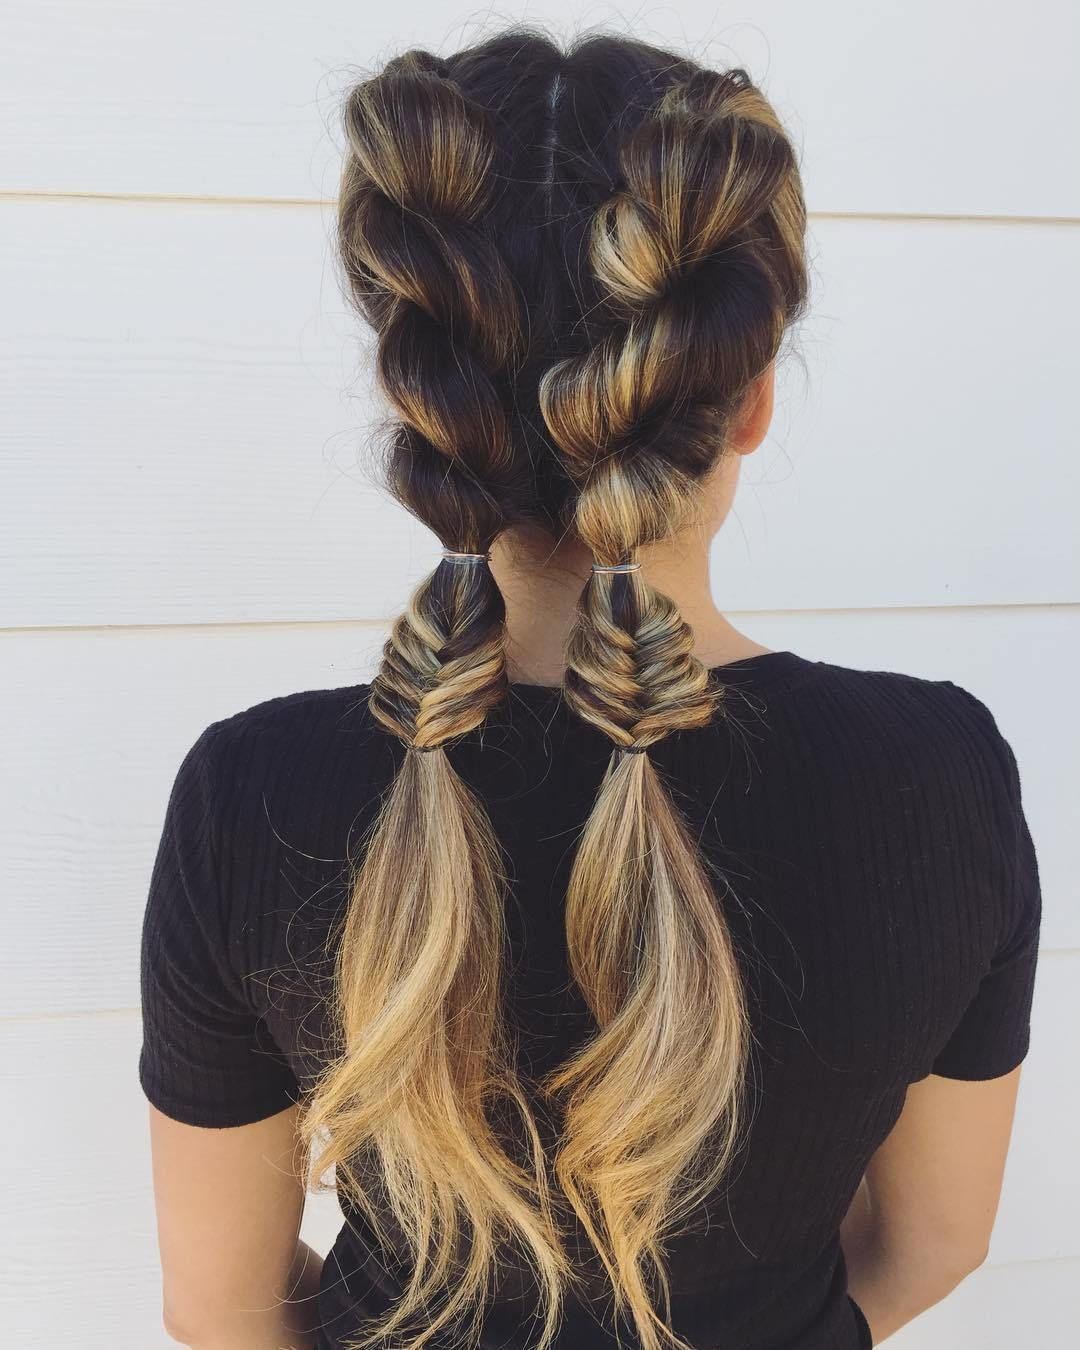 39 Trendy + Messy & Chic Braided Hairstyles | Twist Braids hairstyle #halfuphalfdown #braids #hairstyles